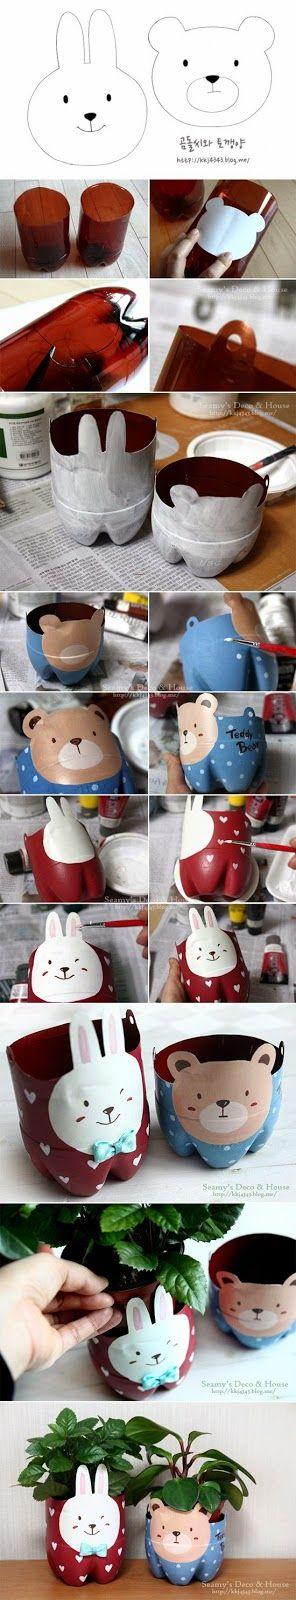 Artesanato com Garrafa Pet: Vasos de bichinhos de garrafa PET